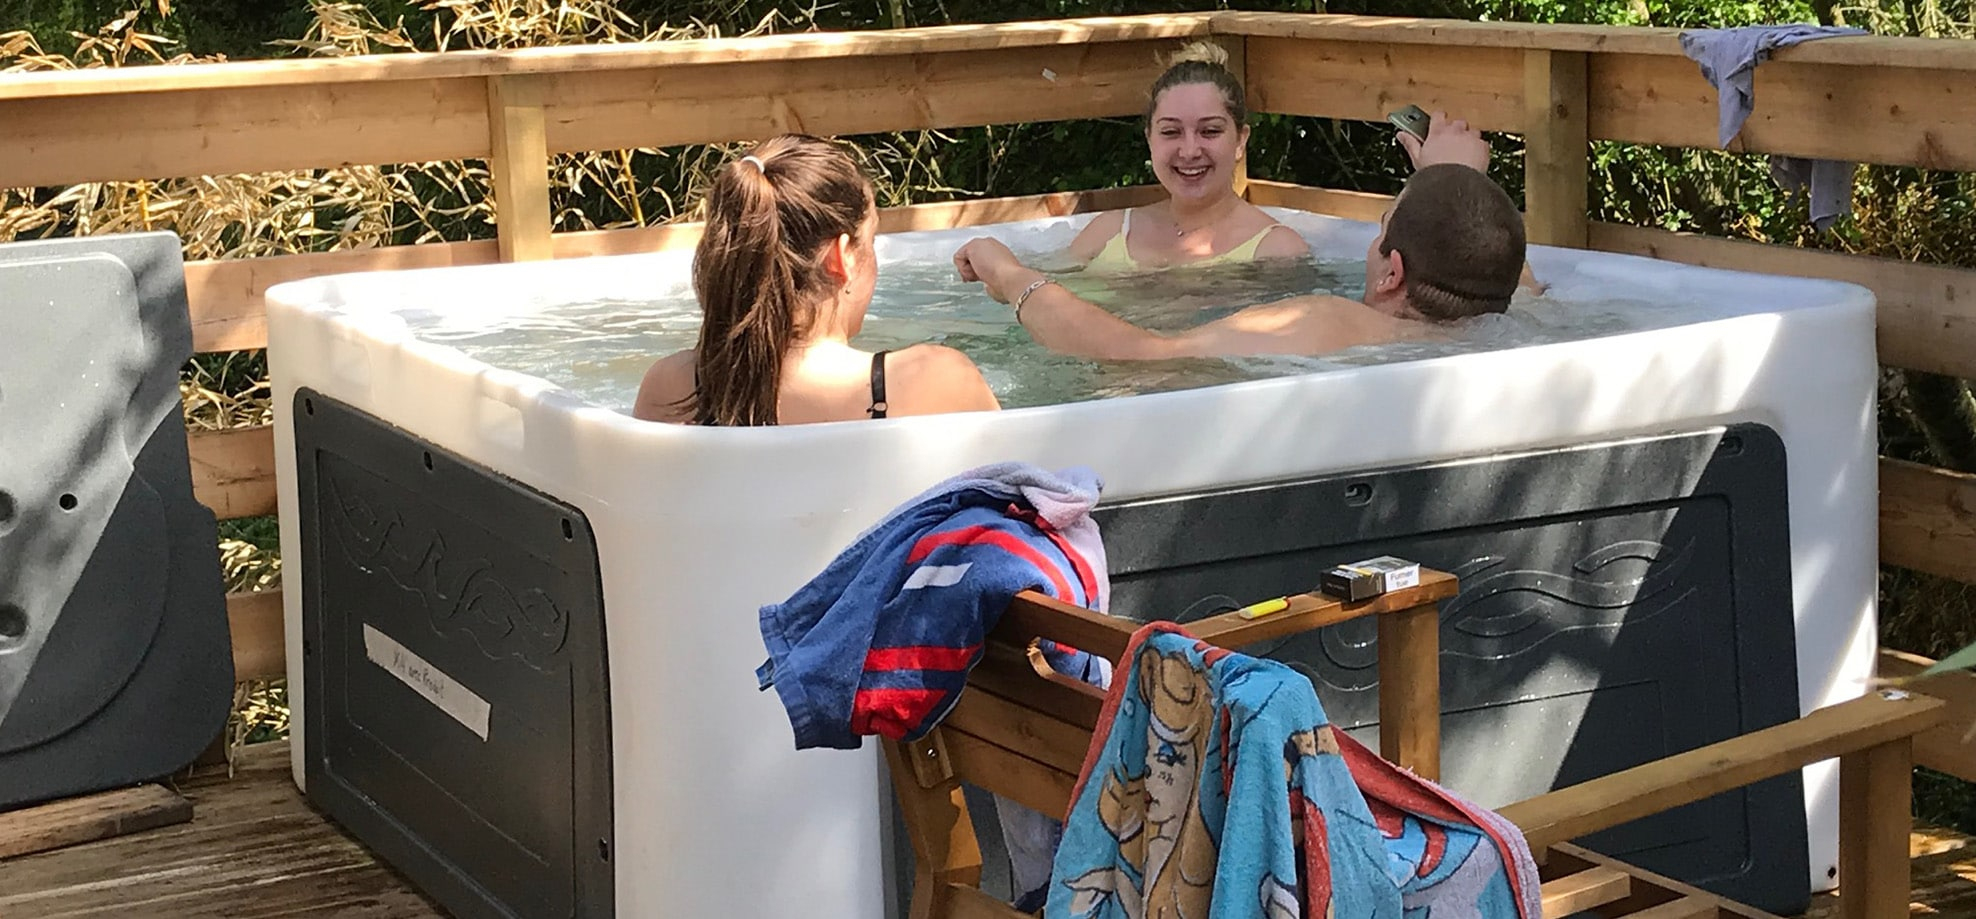 Camping À Bresles : Location De Chalets & Mobil Homes ... concernant Piscine Bresles